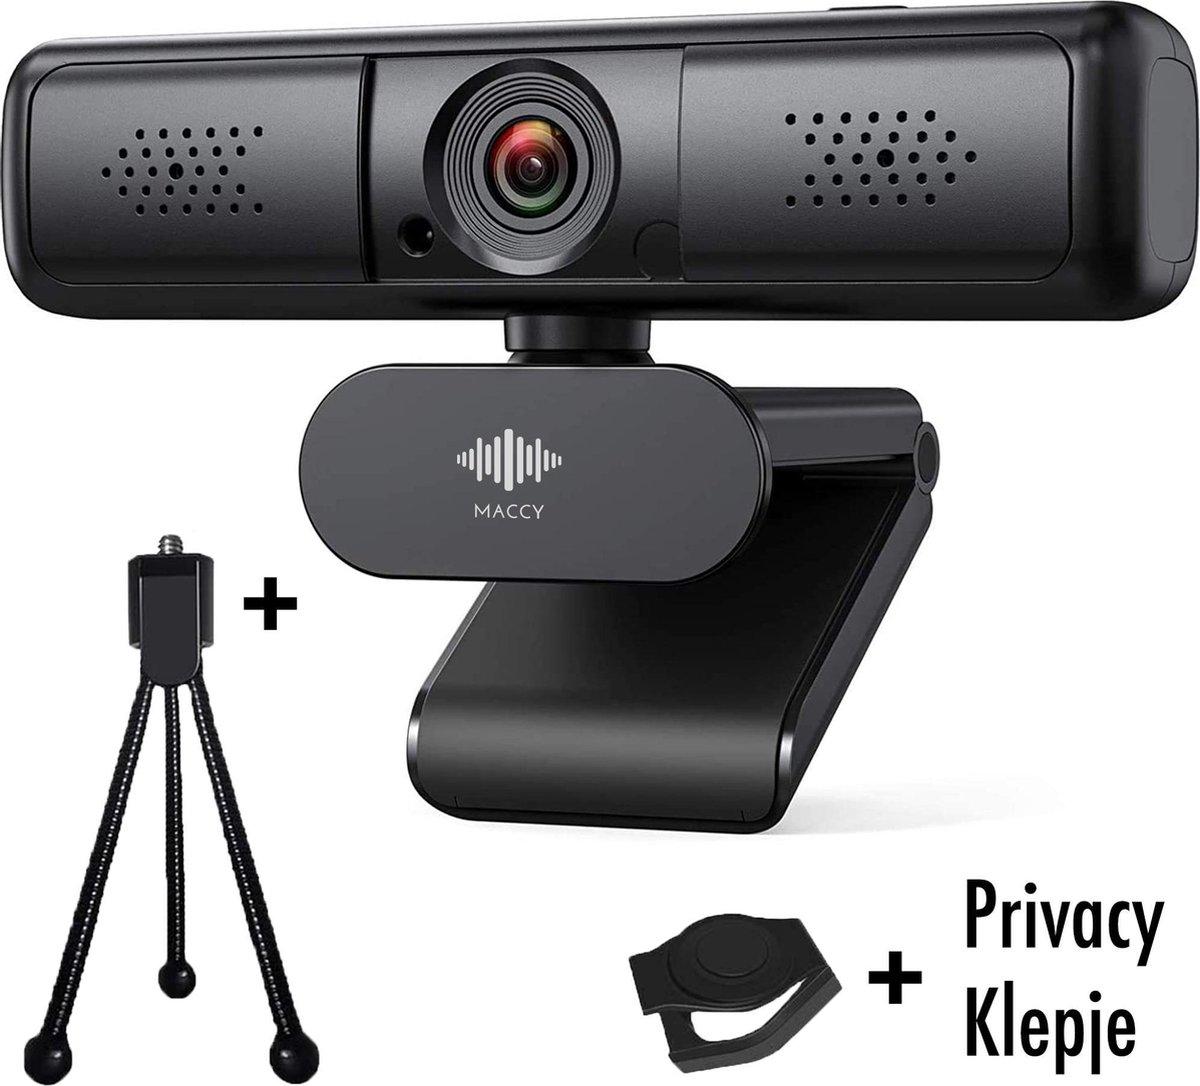 Webcam - 4 MP - Webcam met Microfoon en Tripod! - 2K - 30FPS - 2560x1440 - Webcams - Gaming - Webcam voor PC - Plug&Play - Webcam cover - Laptop Camera - Webcam voor Computer - Windows/IO - Teams - Zoom - USB 2.0 - Werk & thuis